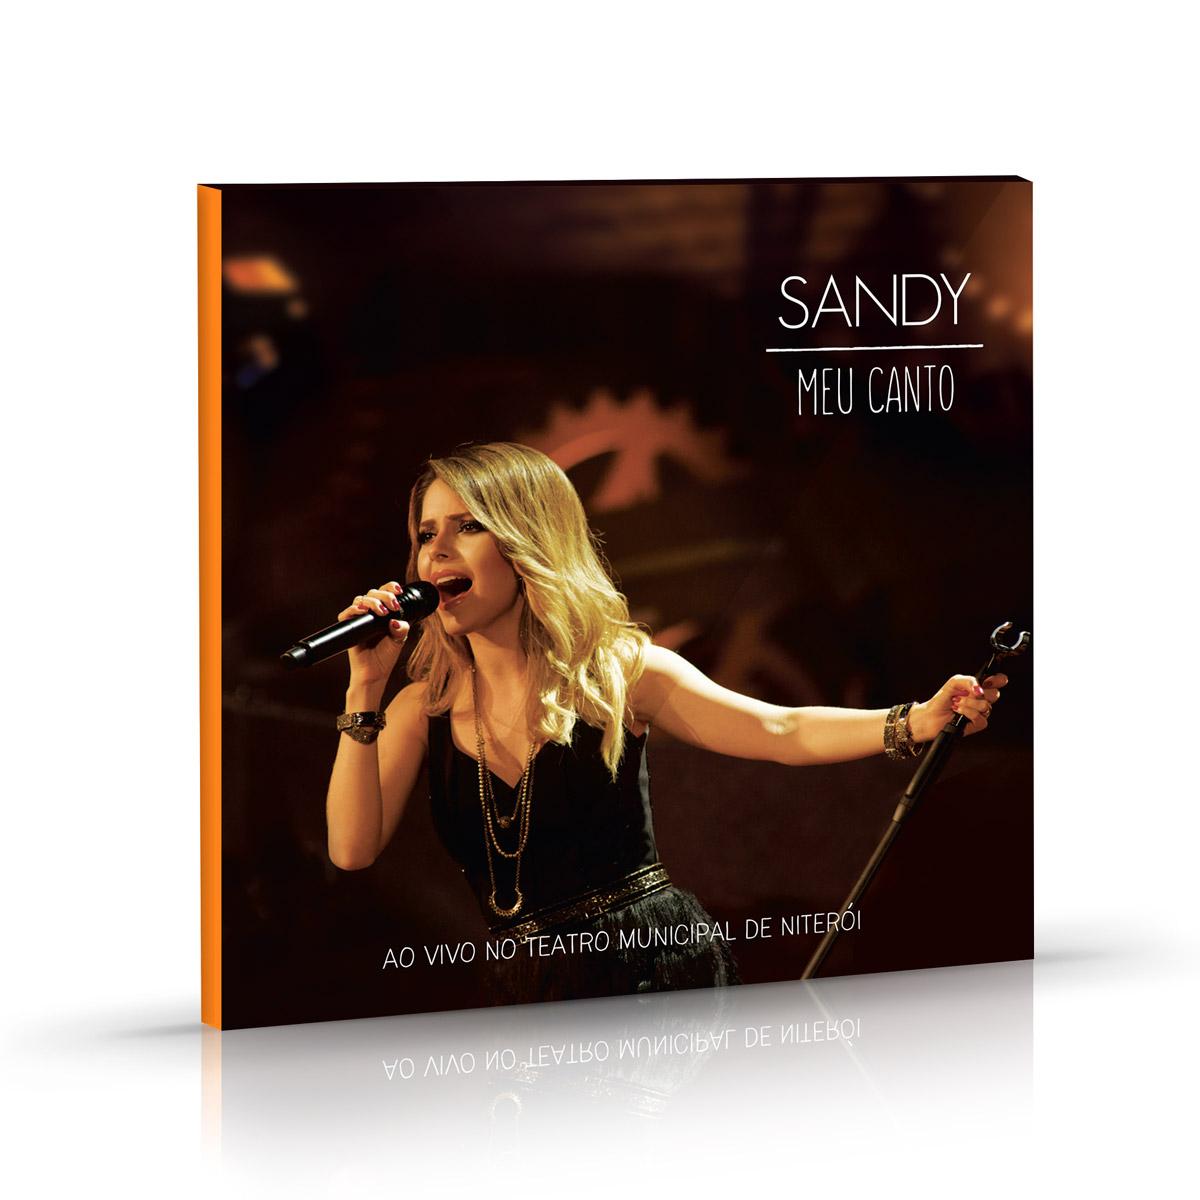 Combo Sandy CD Meu Canto + Camiseta Masculina + Copo